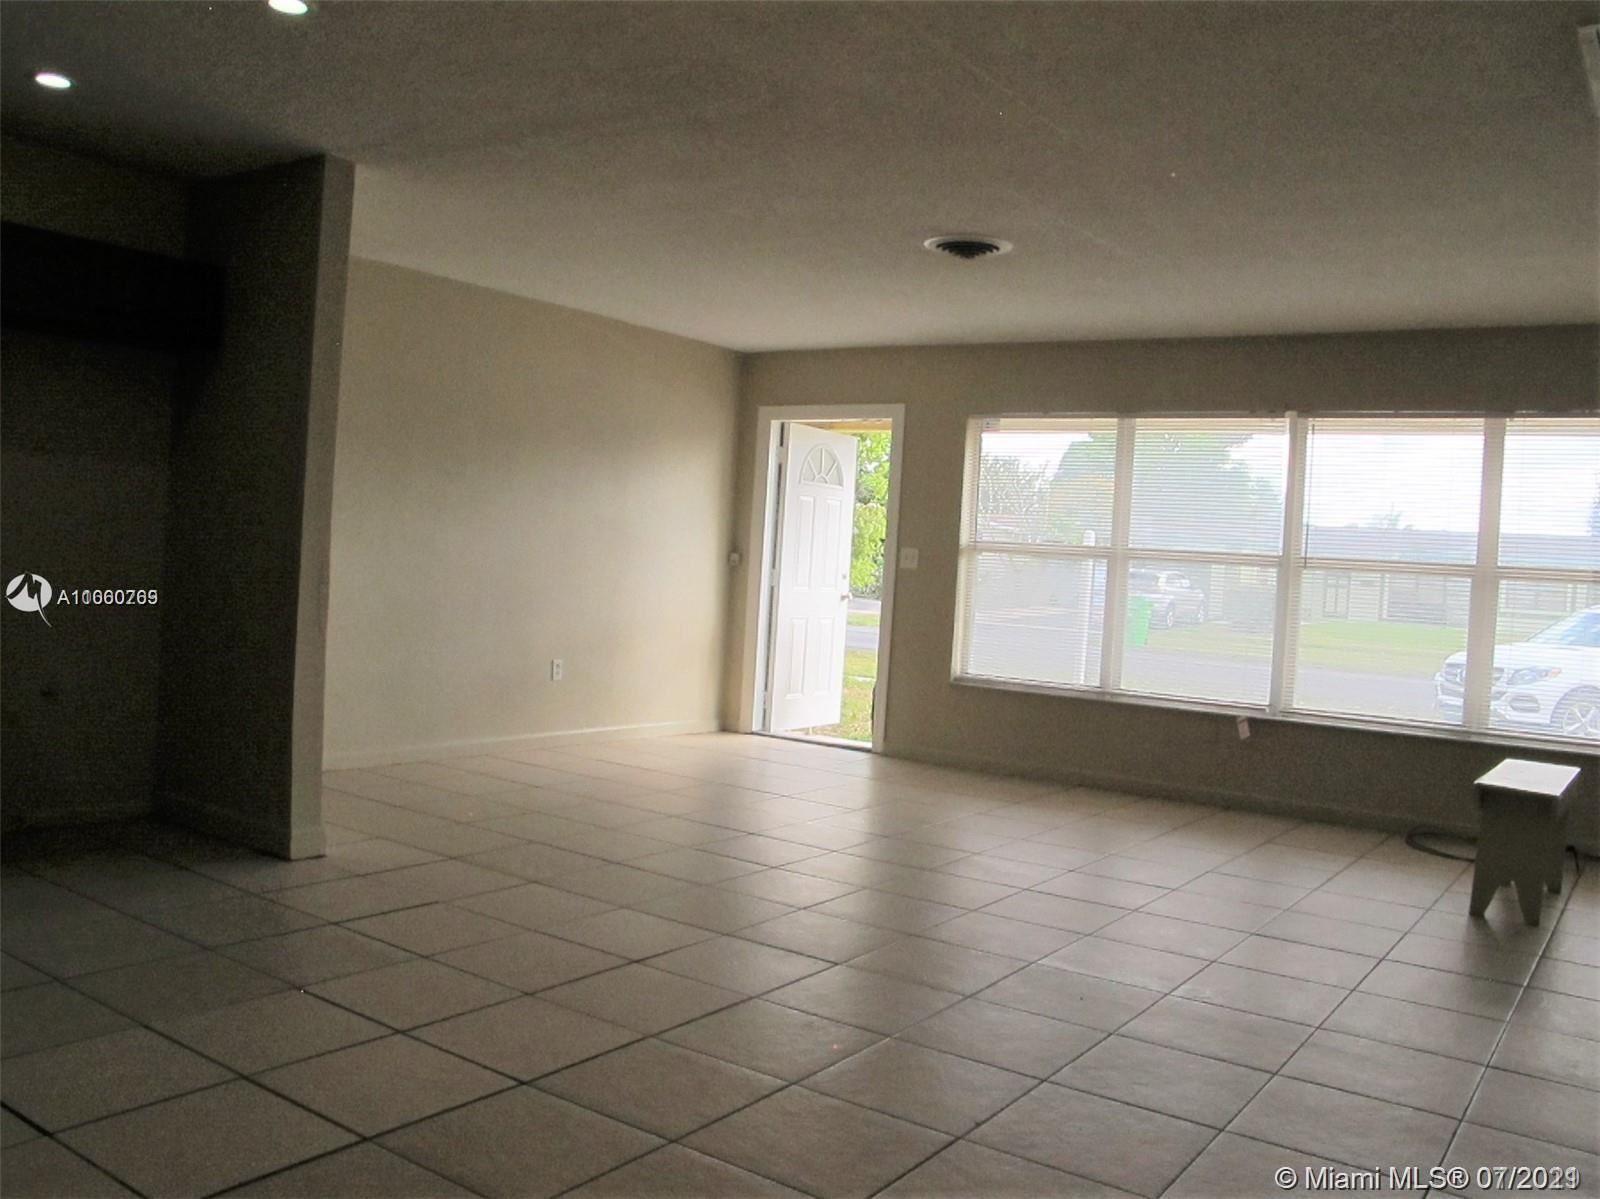 Photo of 5979 NW 15th St, Sunrise, FL 33313 (MLS # A11060769)